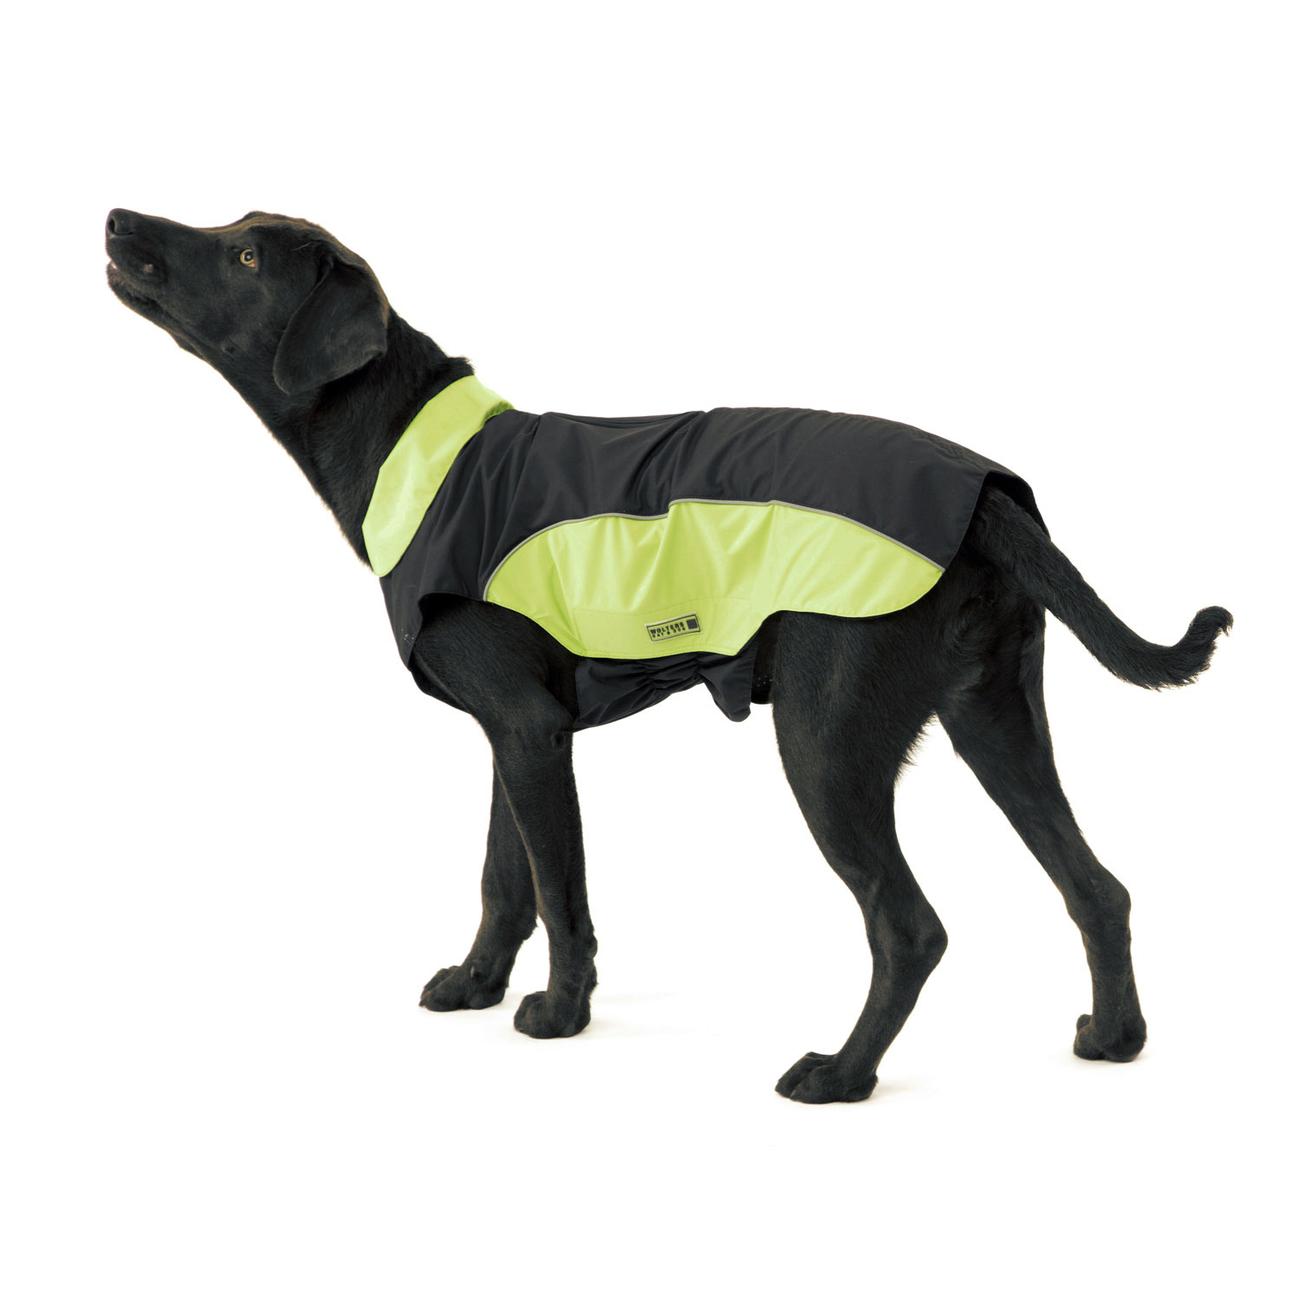 Wolters Regenjacke für Hunde Easy Rain, Bild 3